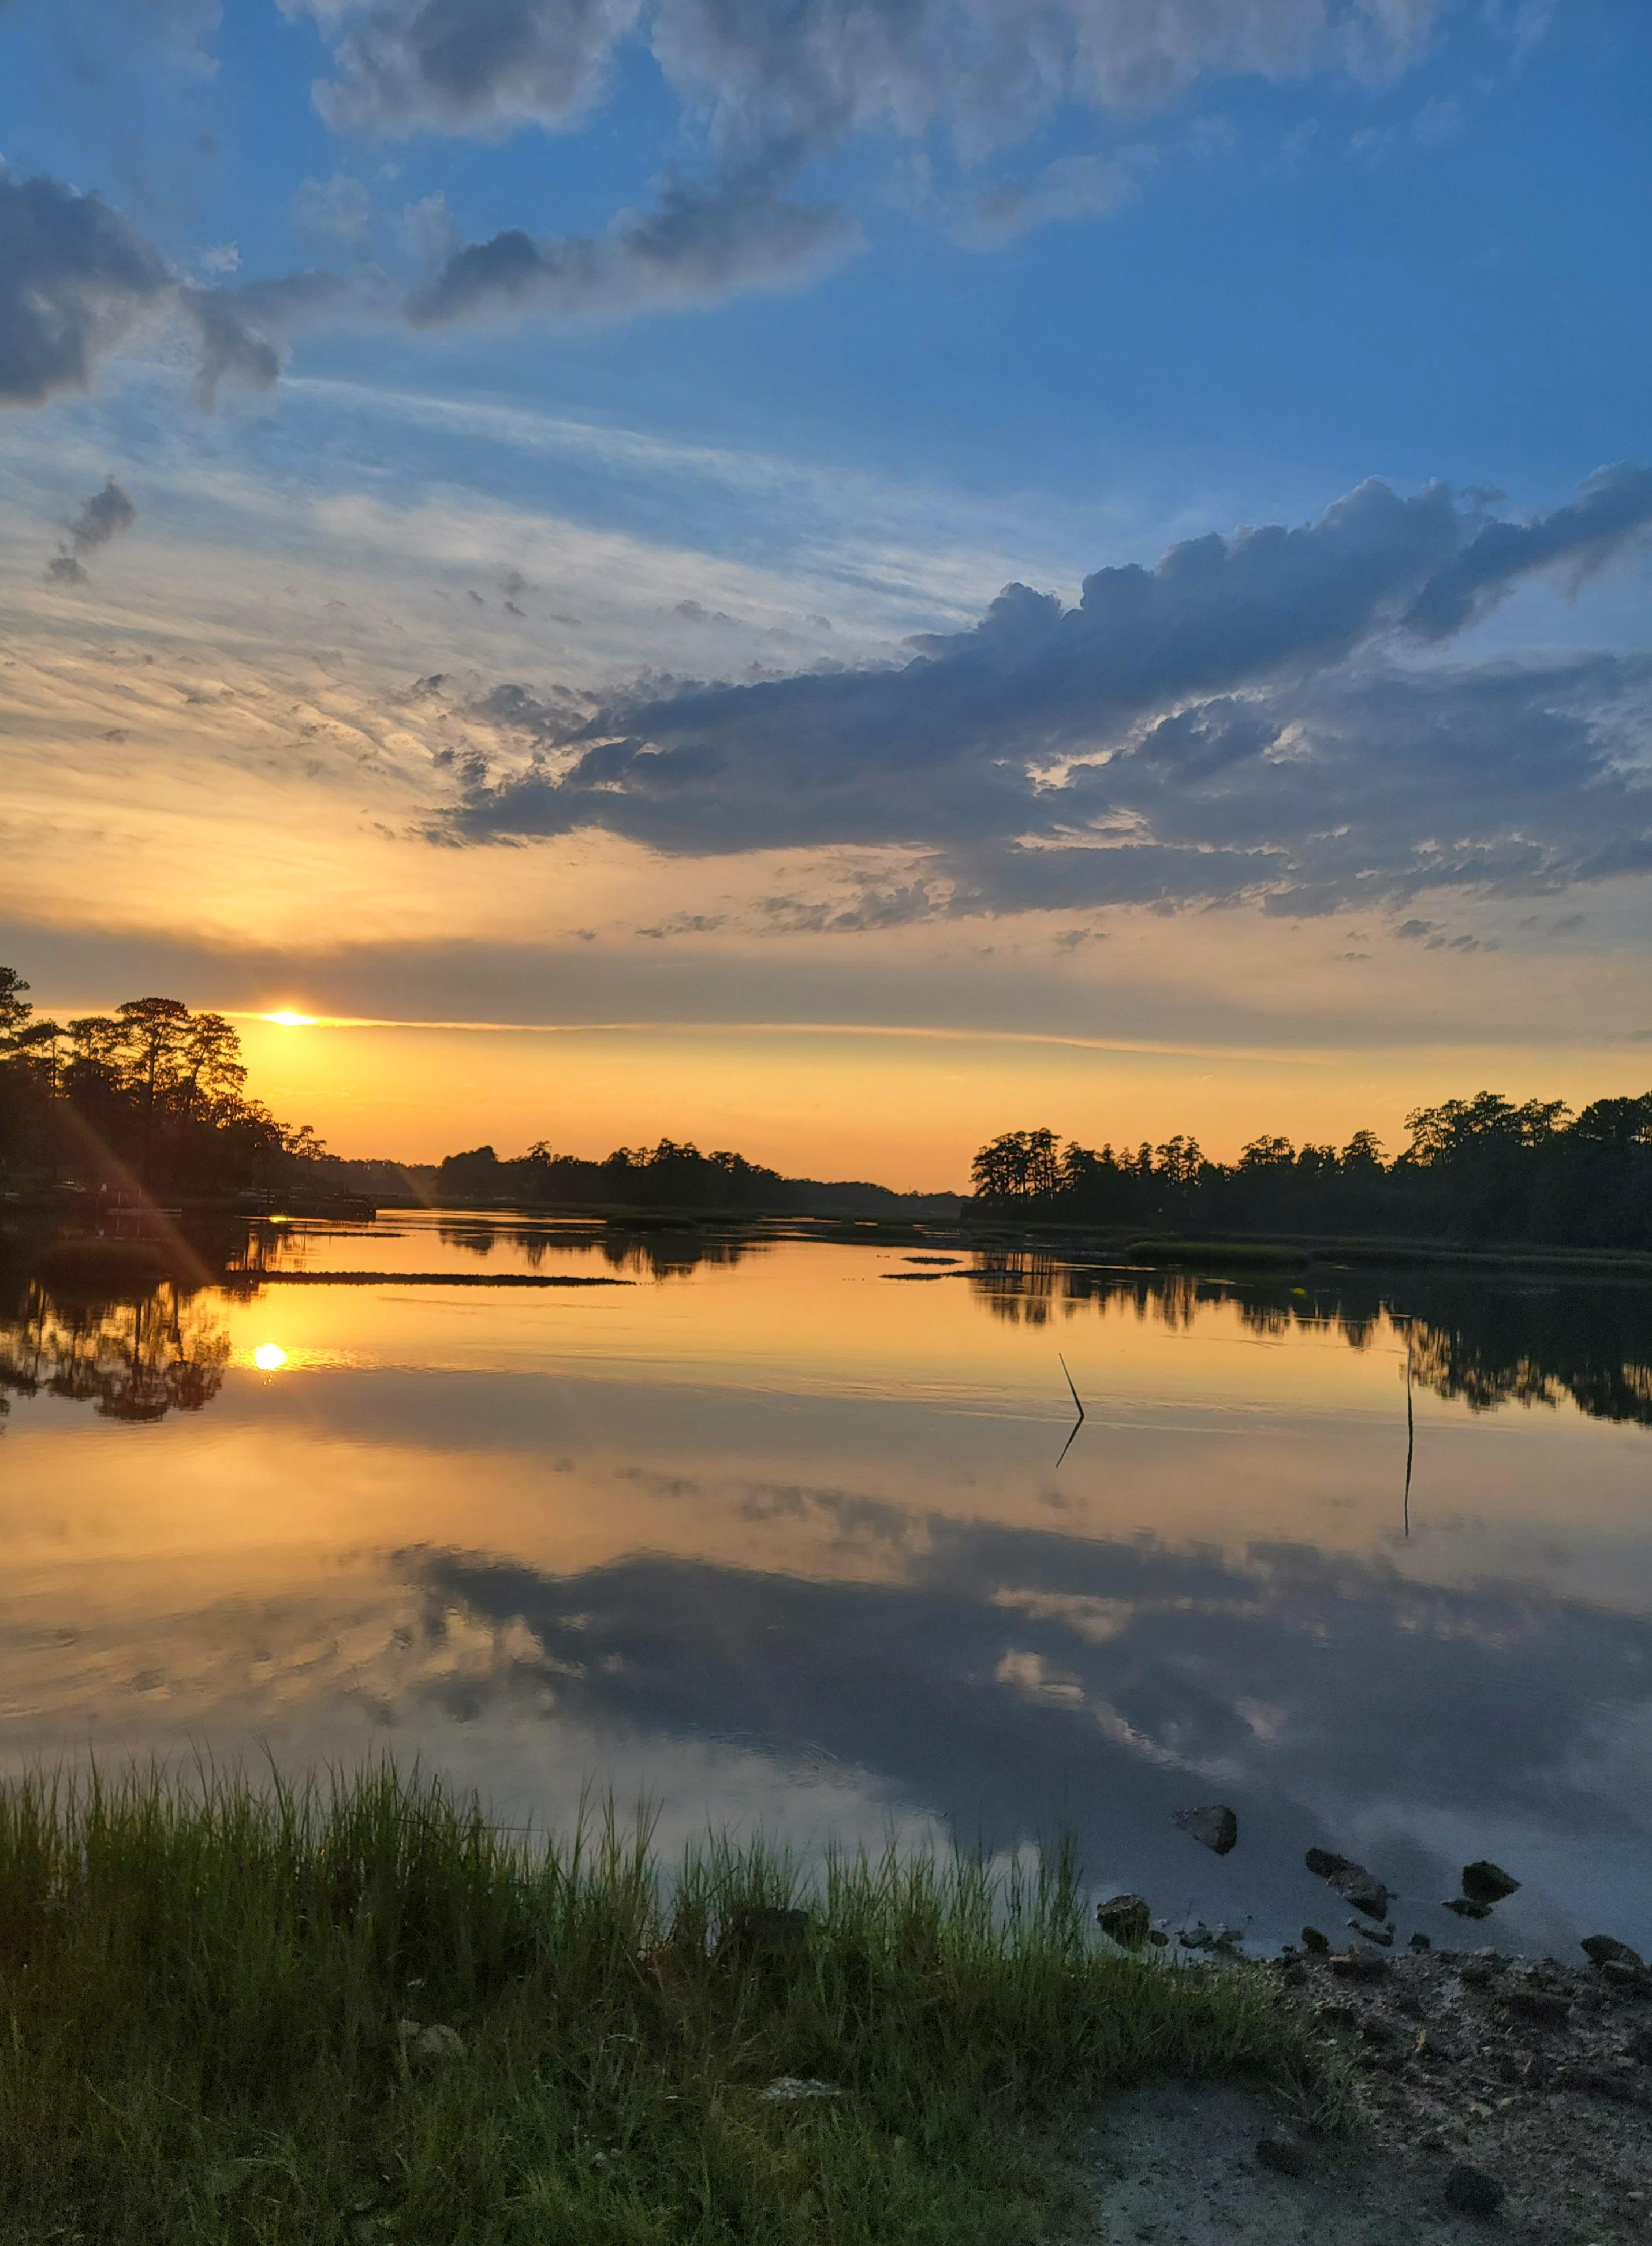 September 2021 Around the Azalea Coast | events and community news in Southeastern Coastal North Carolina